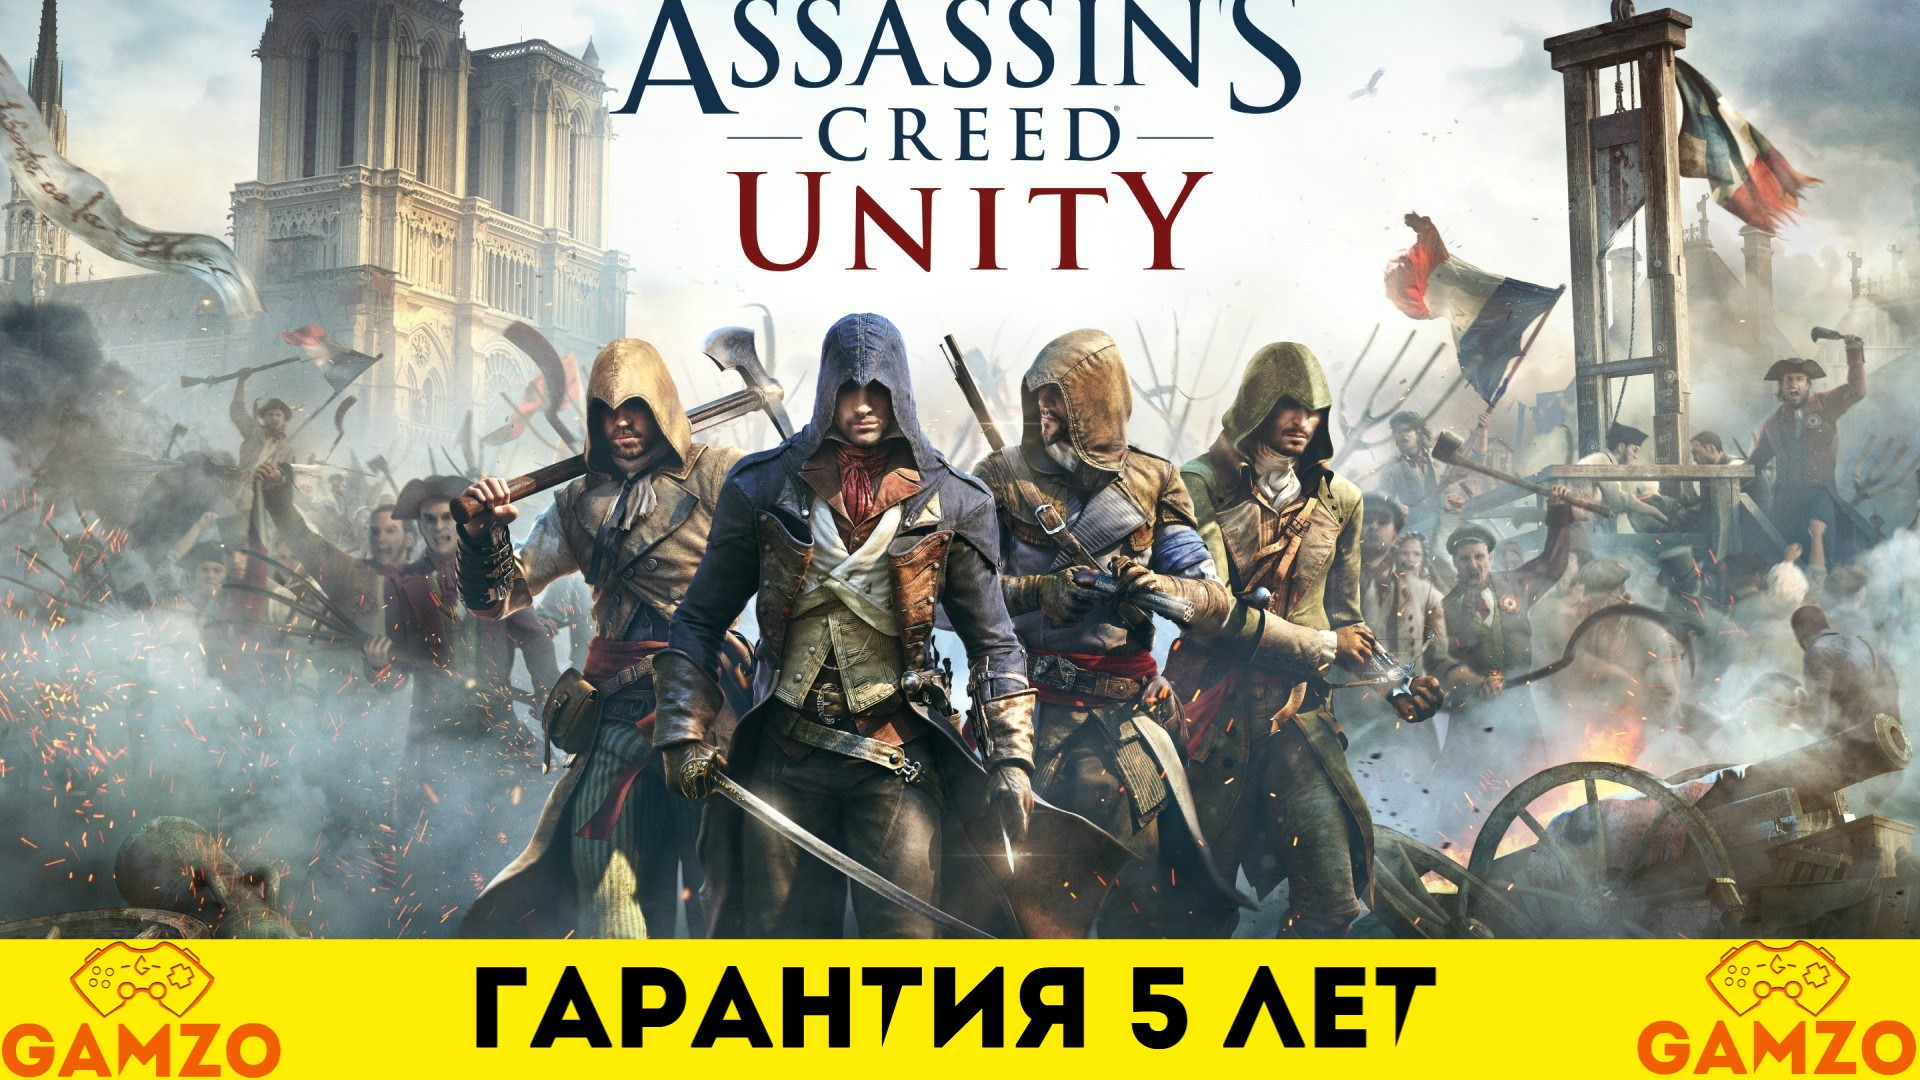 Assassins Creed: Unity [Гарантия 5 лет] + Подарок